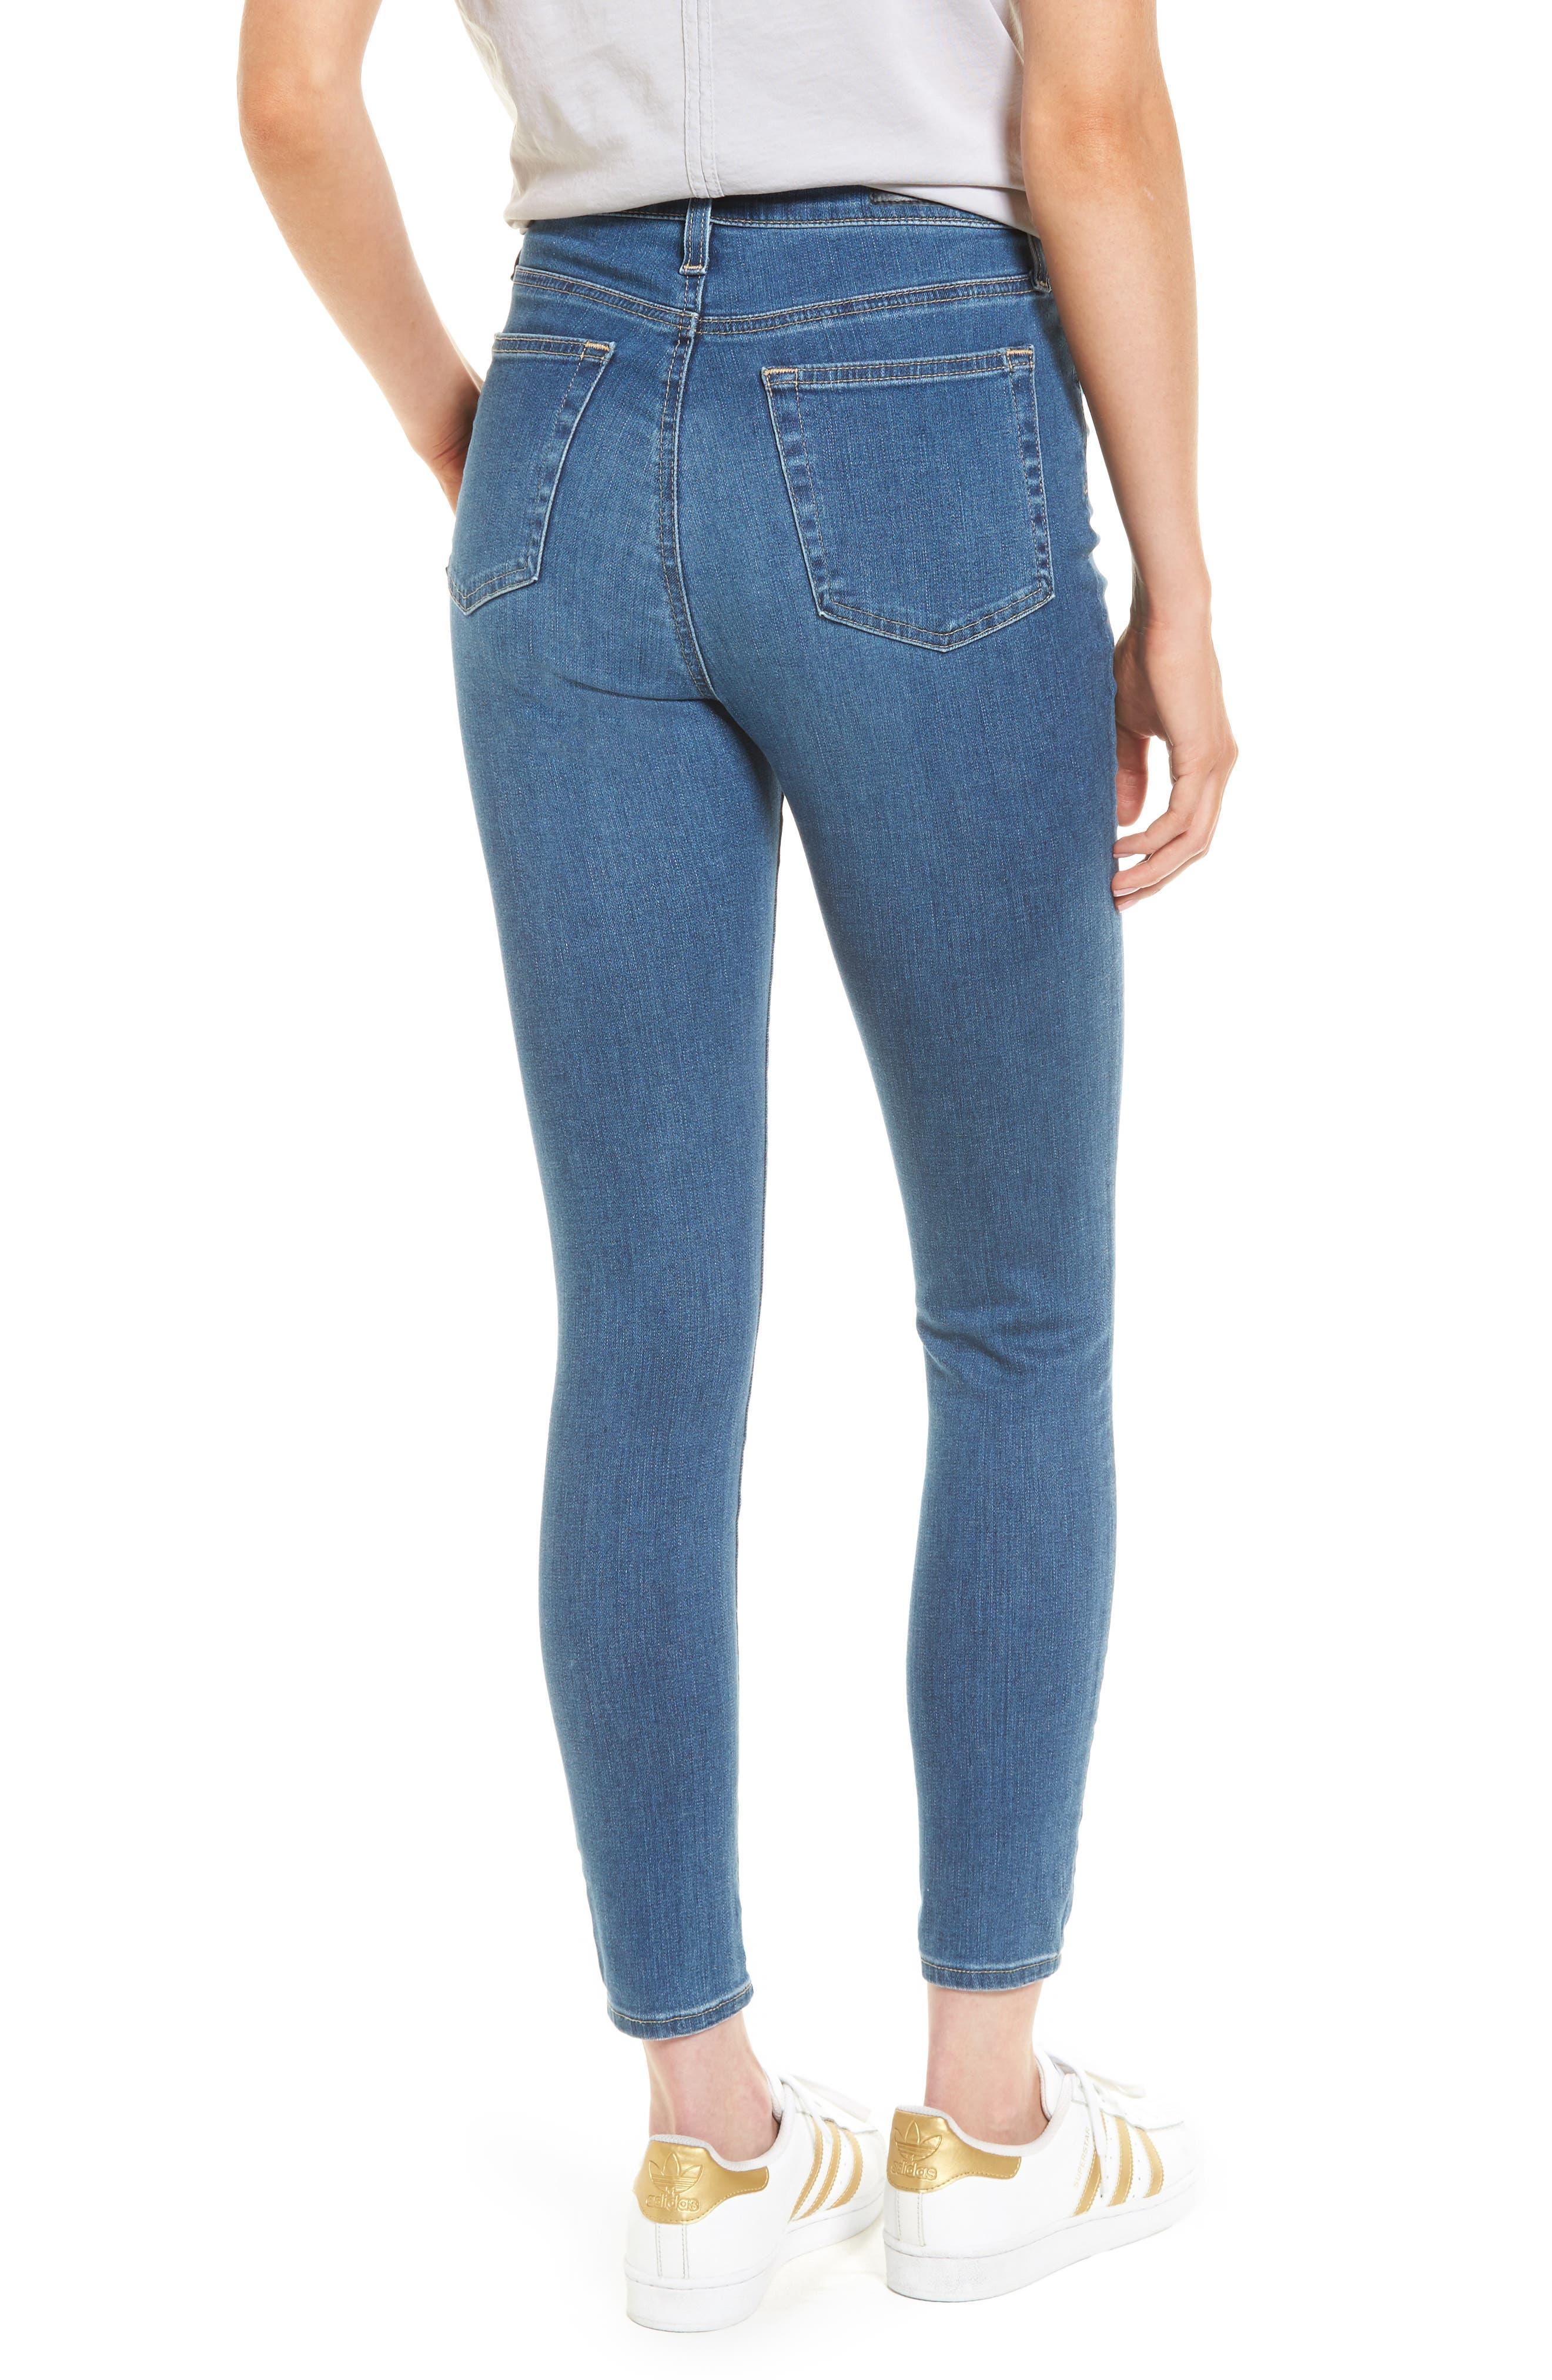 Mila High Waist Ankle Skinny Jeans,                             Alternate thumbnail 2, color,                             416